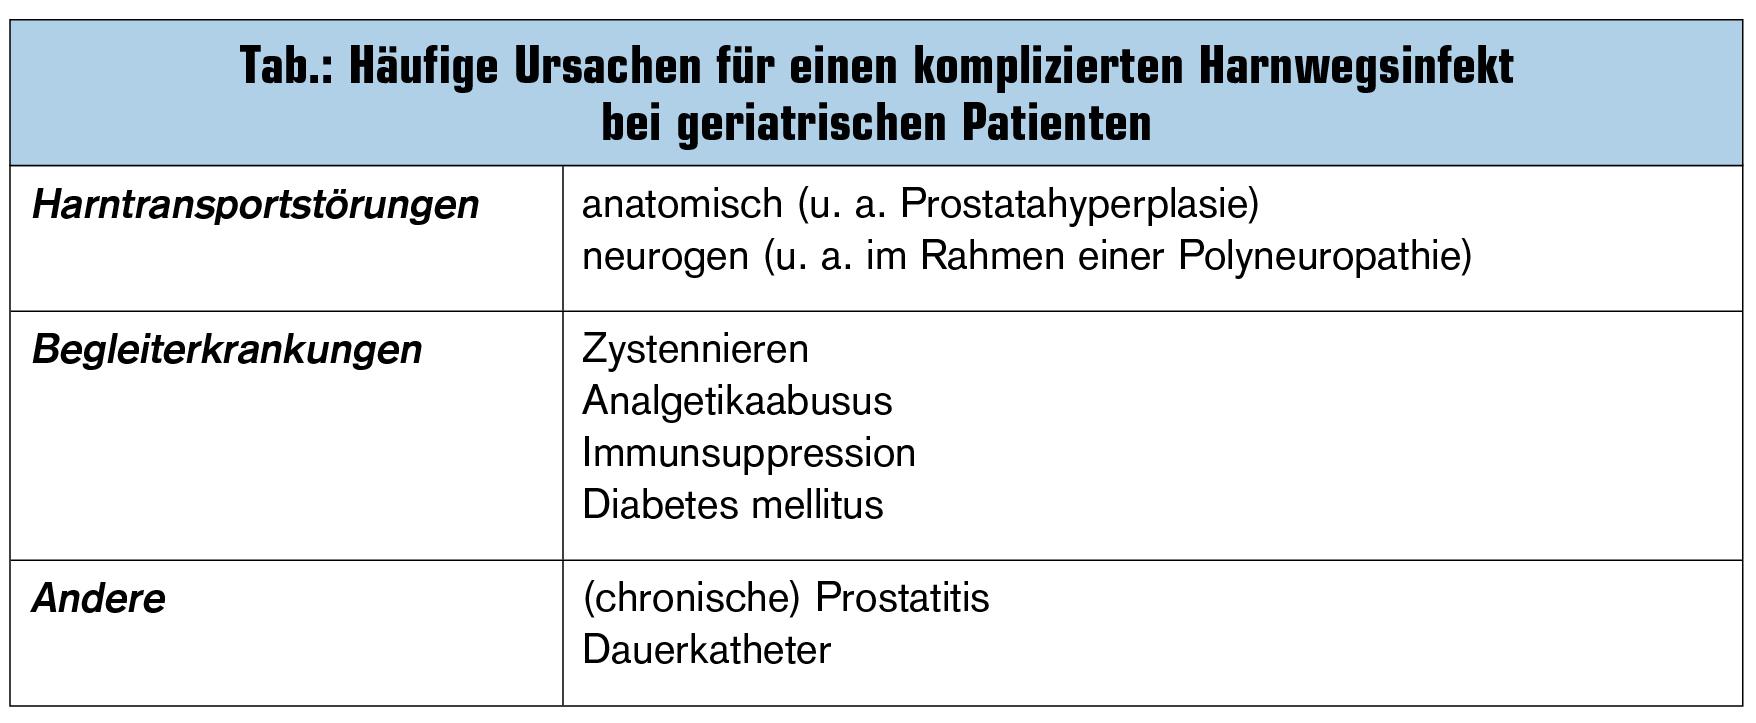 komplizierte harnwegsinfektion therapie